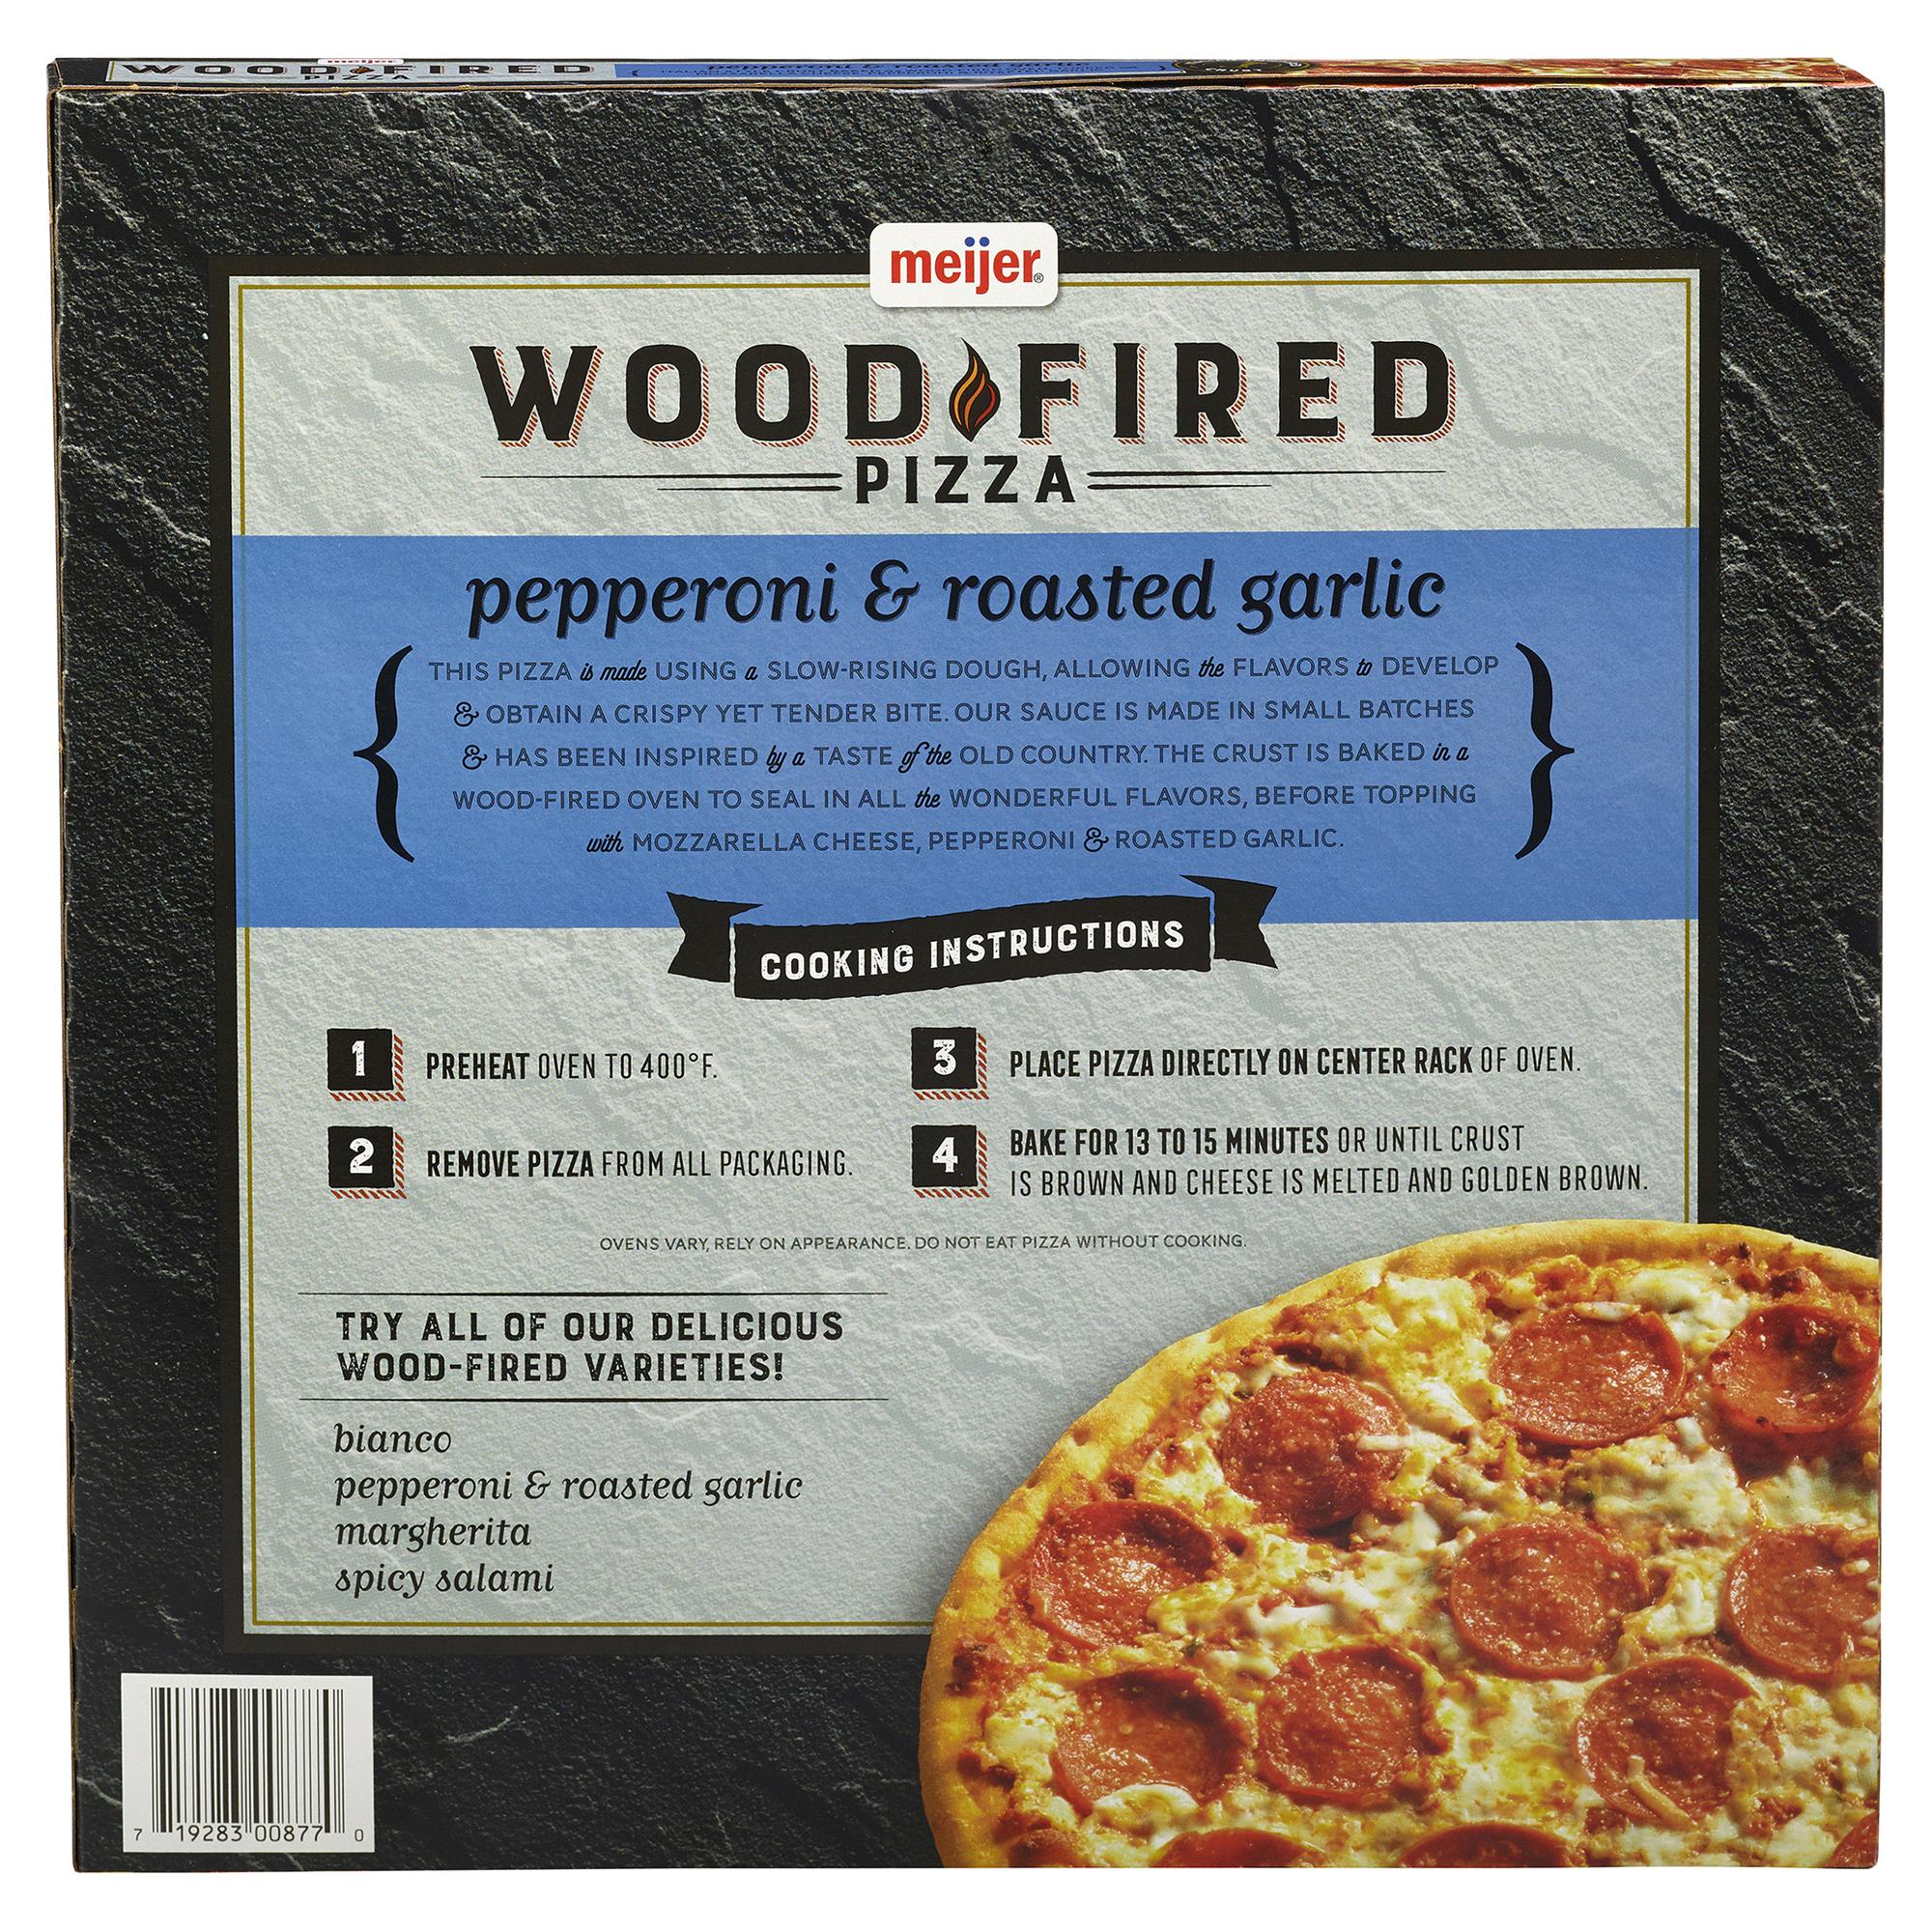 Meijer Wood Fired Pizza Pepperoni 12.25 oz | Meijer.com